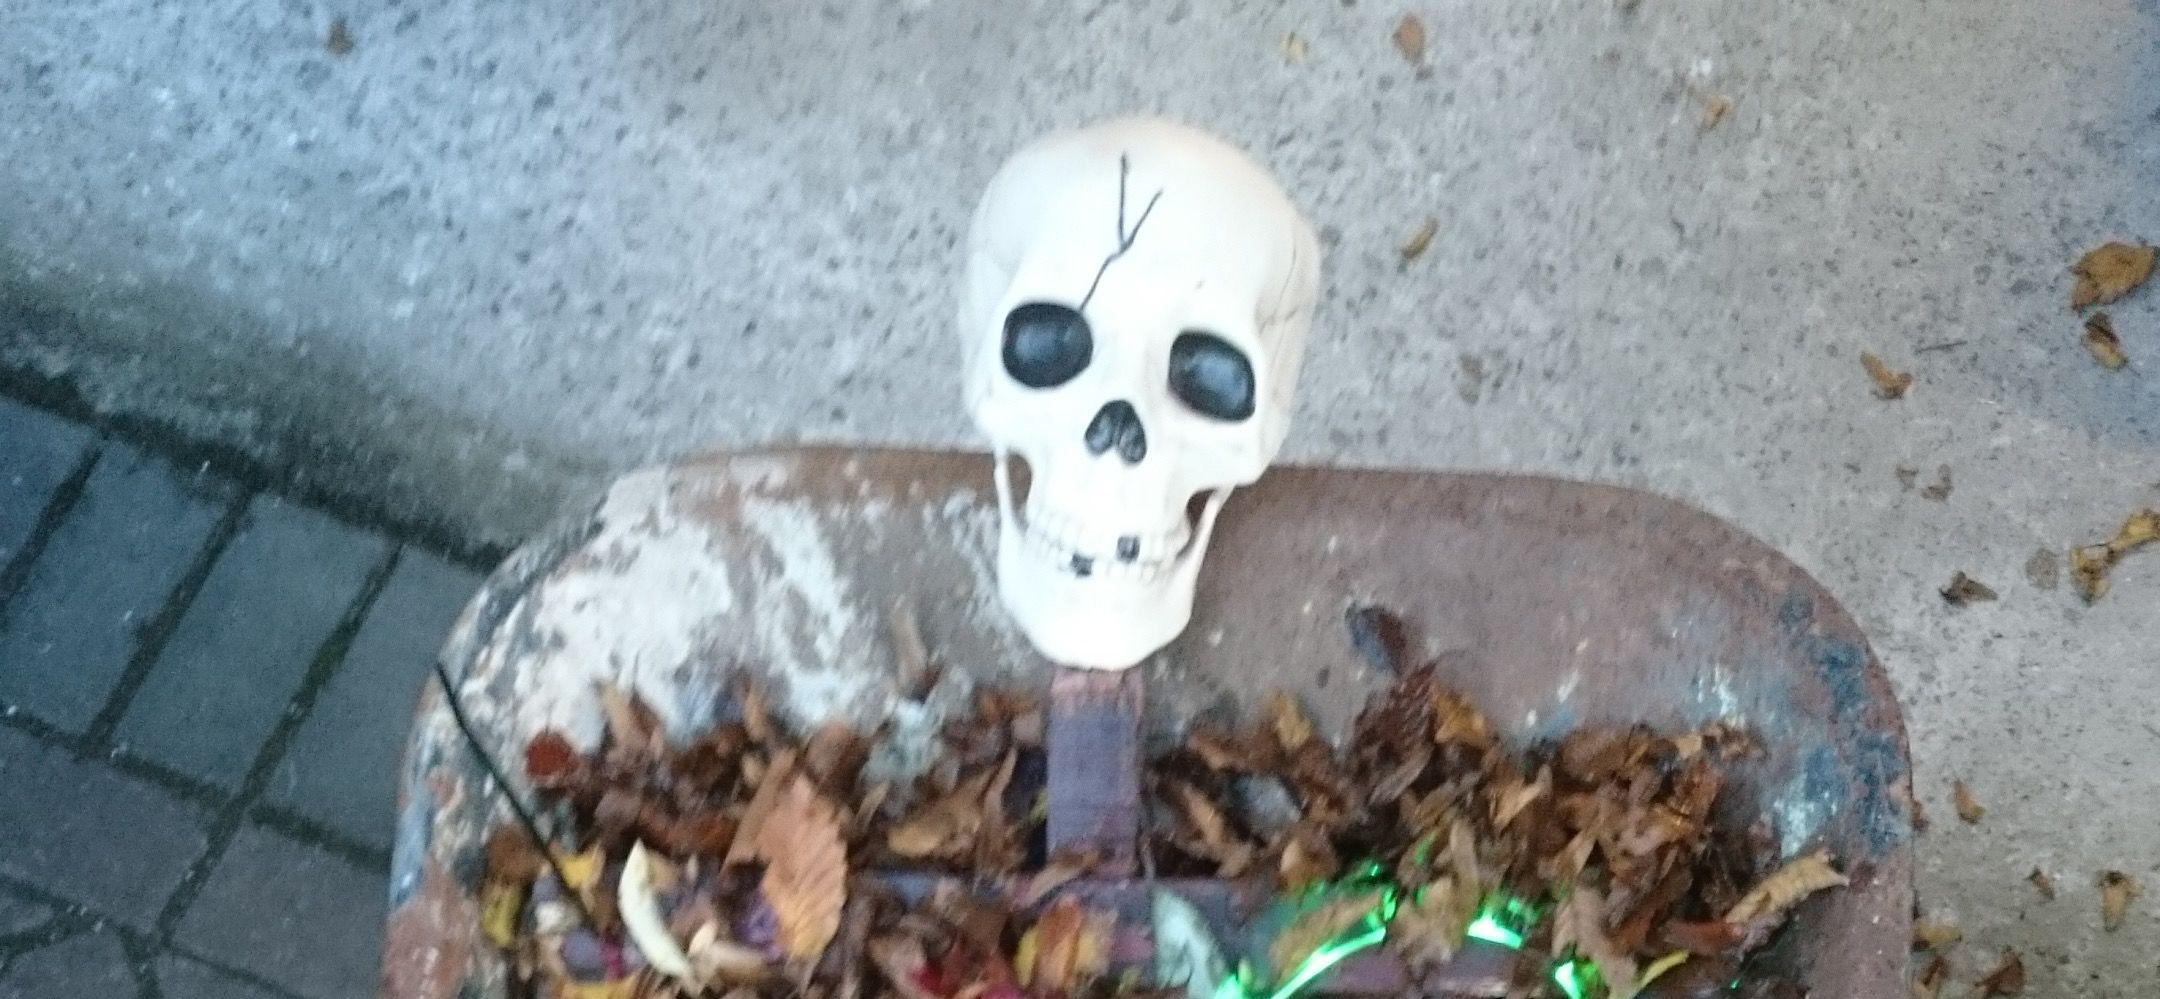 Great Halloween Yard Decoration for Under $20.